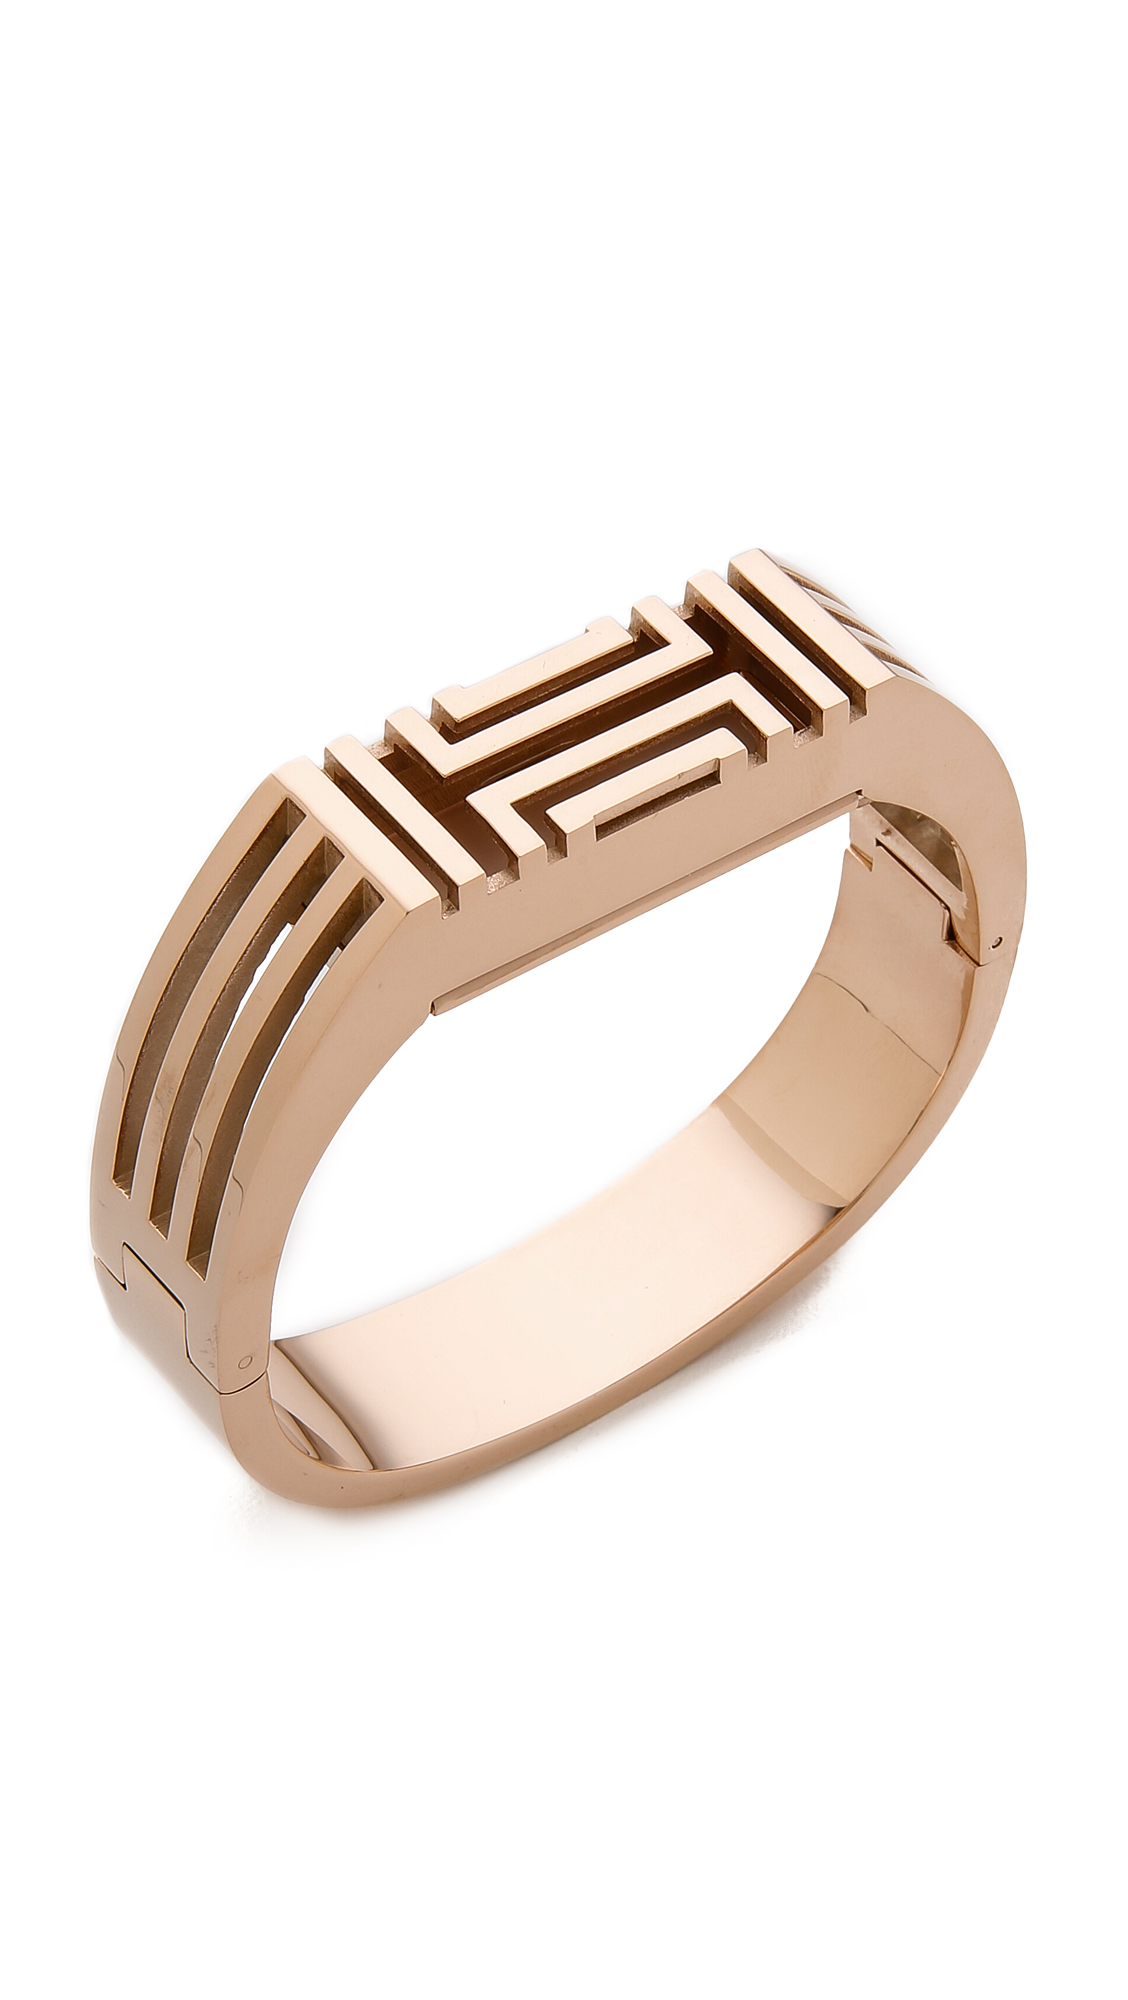 bdd21c0cf1e Tory Burch Tory Burch for Fitbit Metal Hinged Bracelet